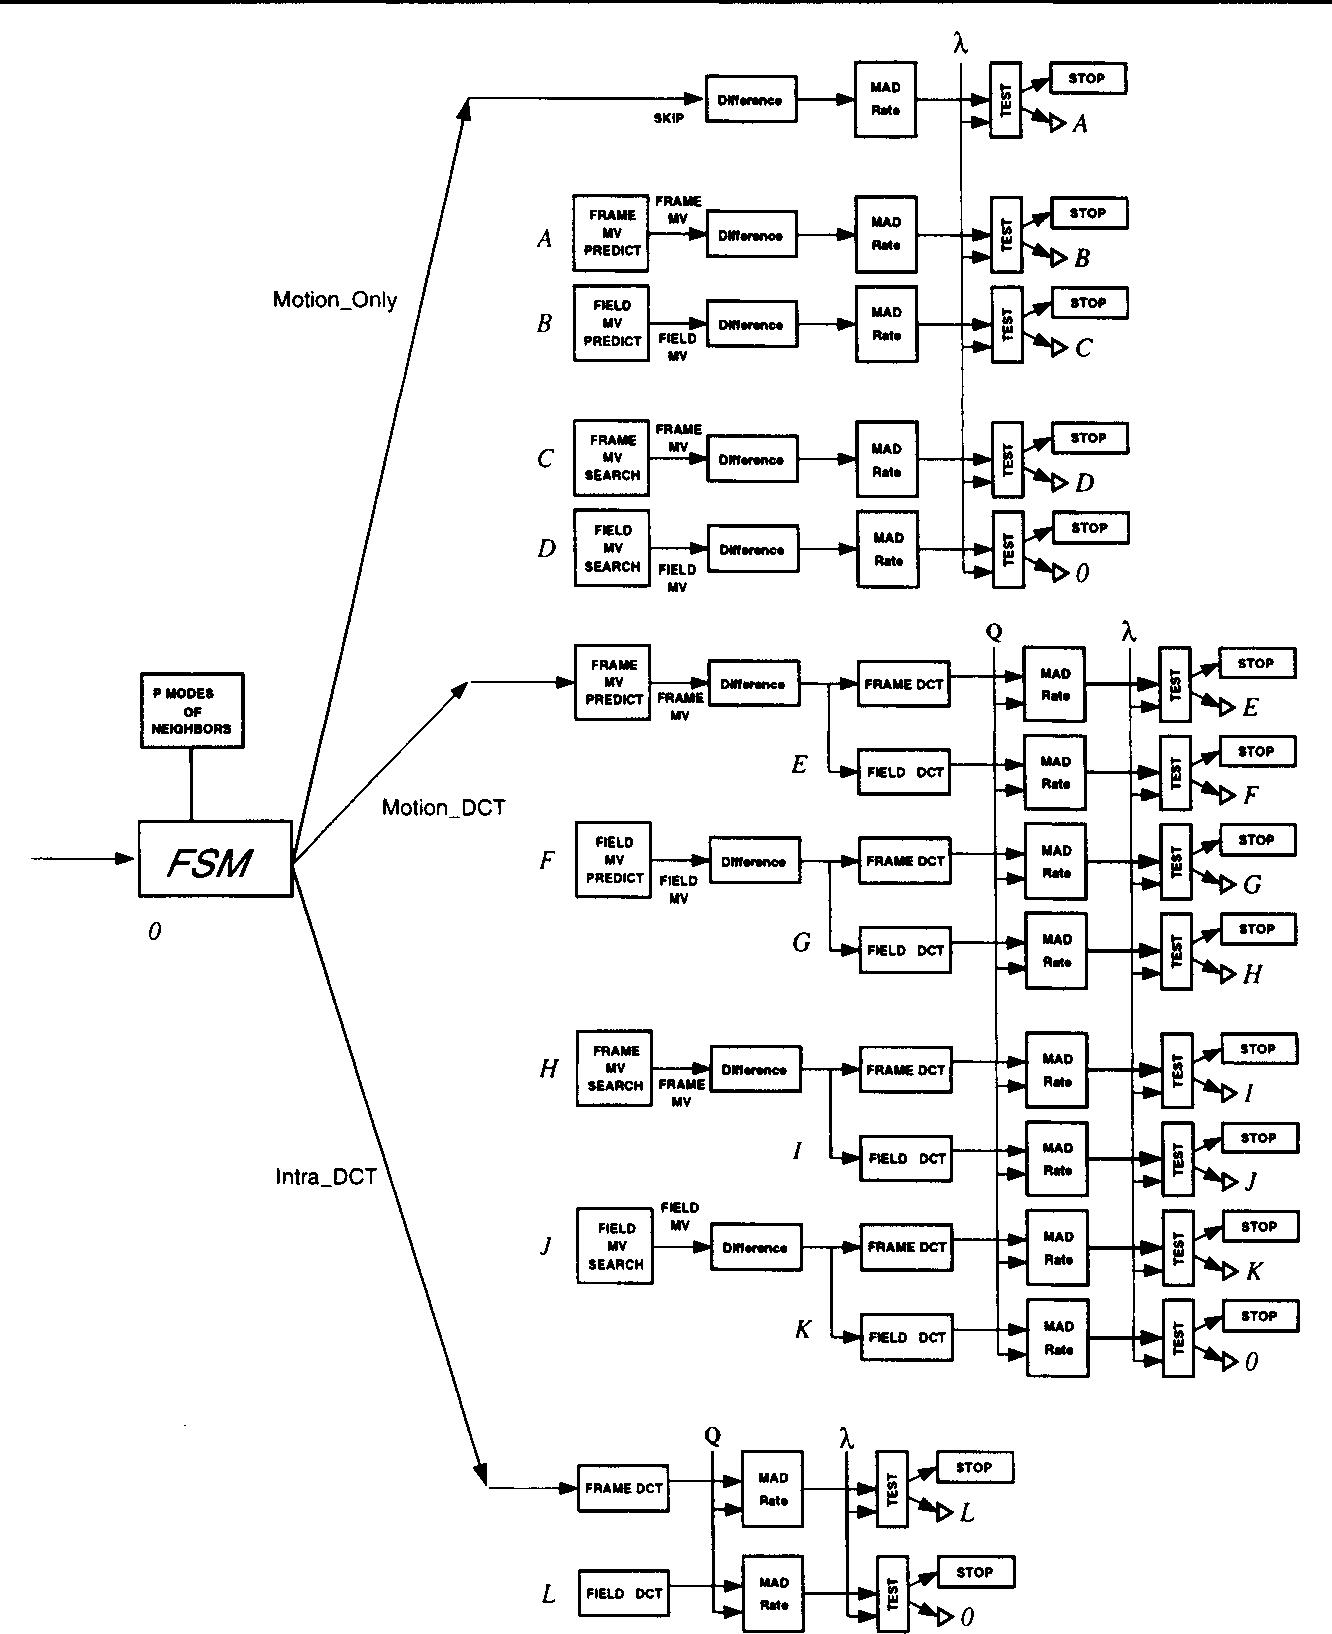 Cable Television Semantic Scholar Pictnetworkdiagramregionalcableheadenddiagram Figure 3